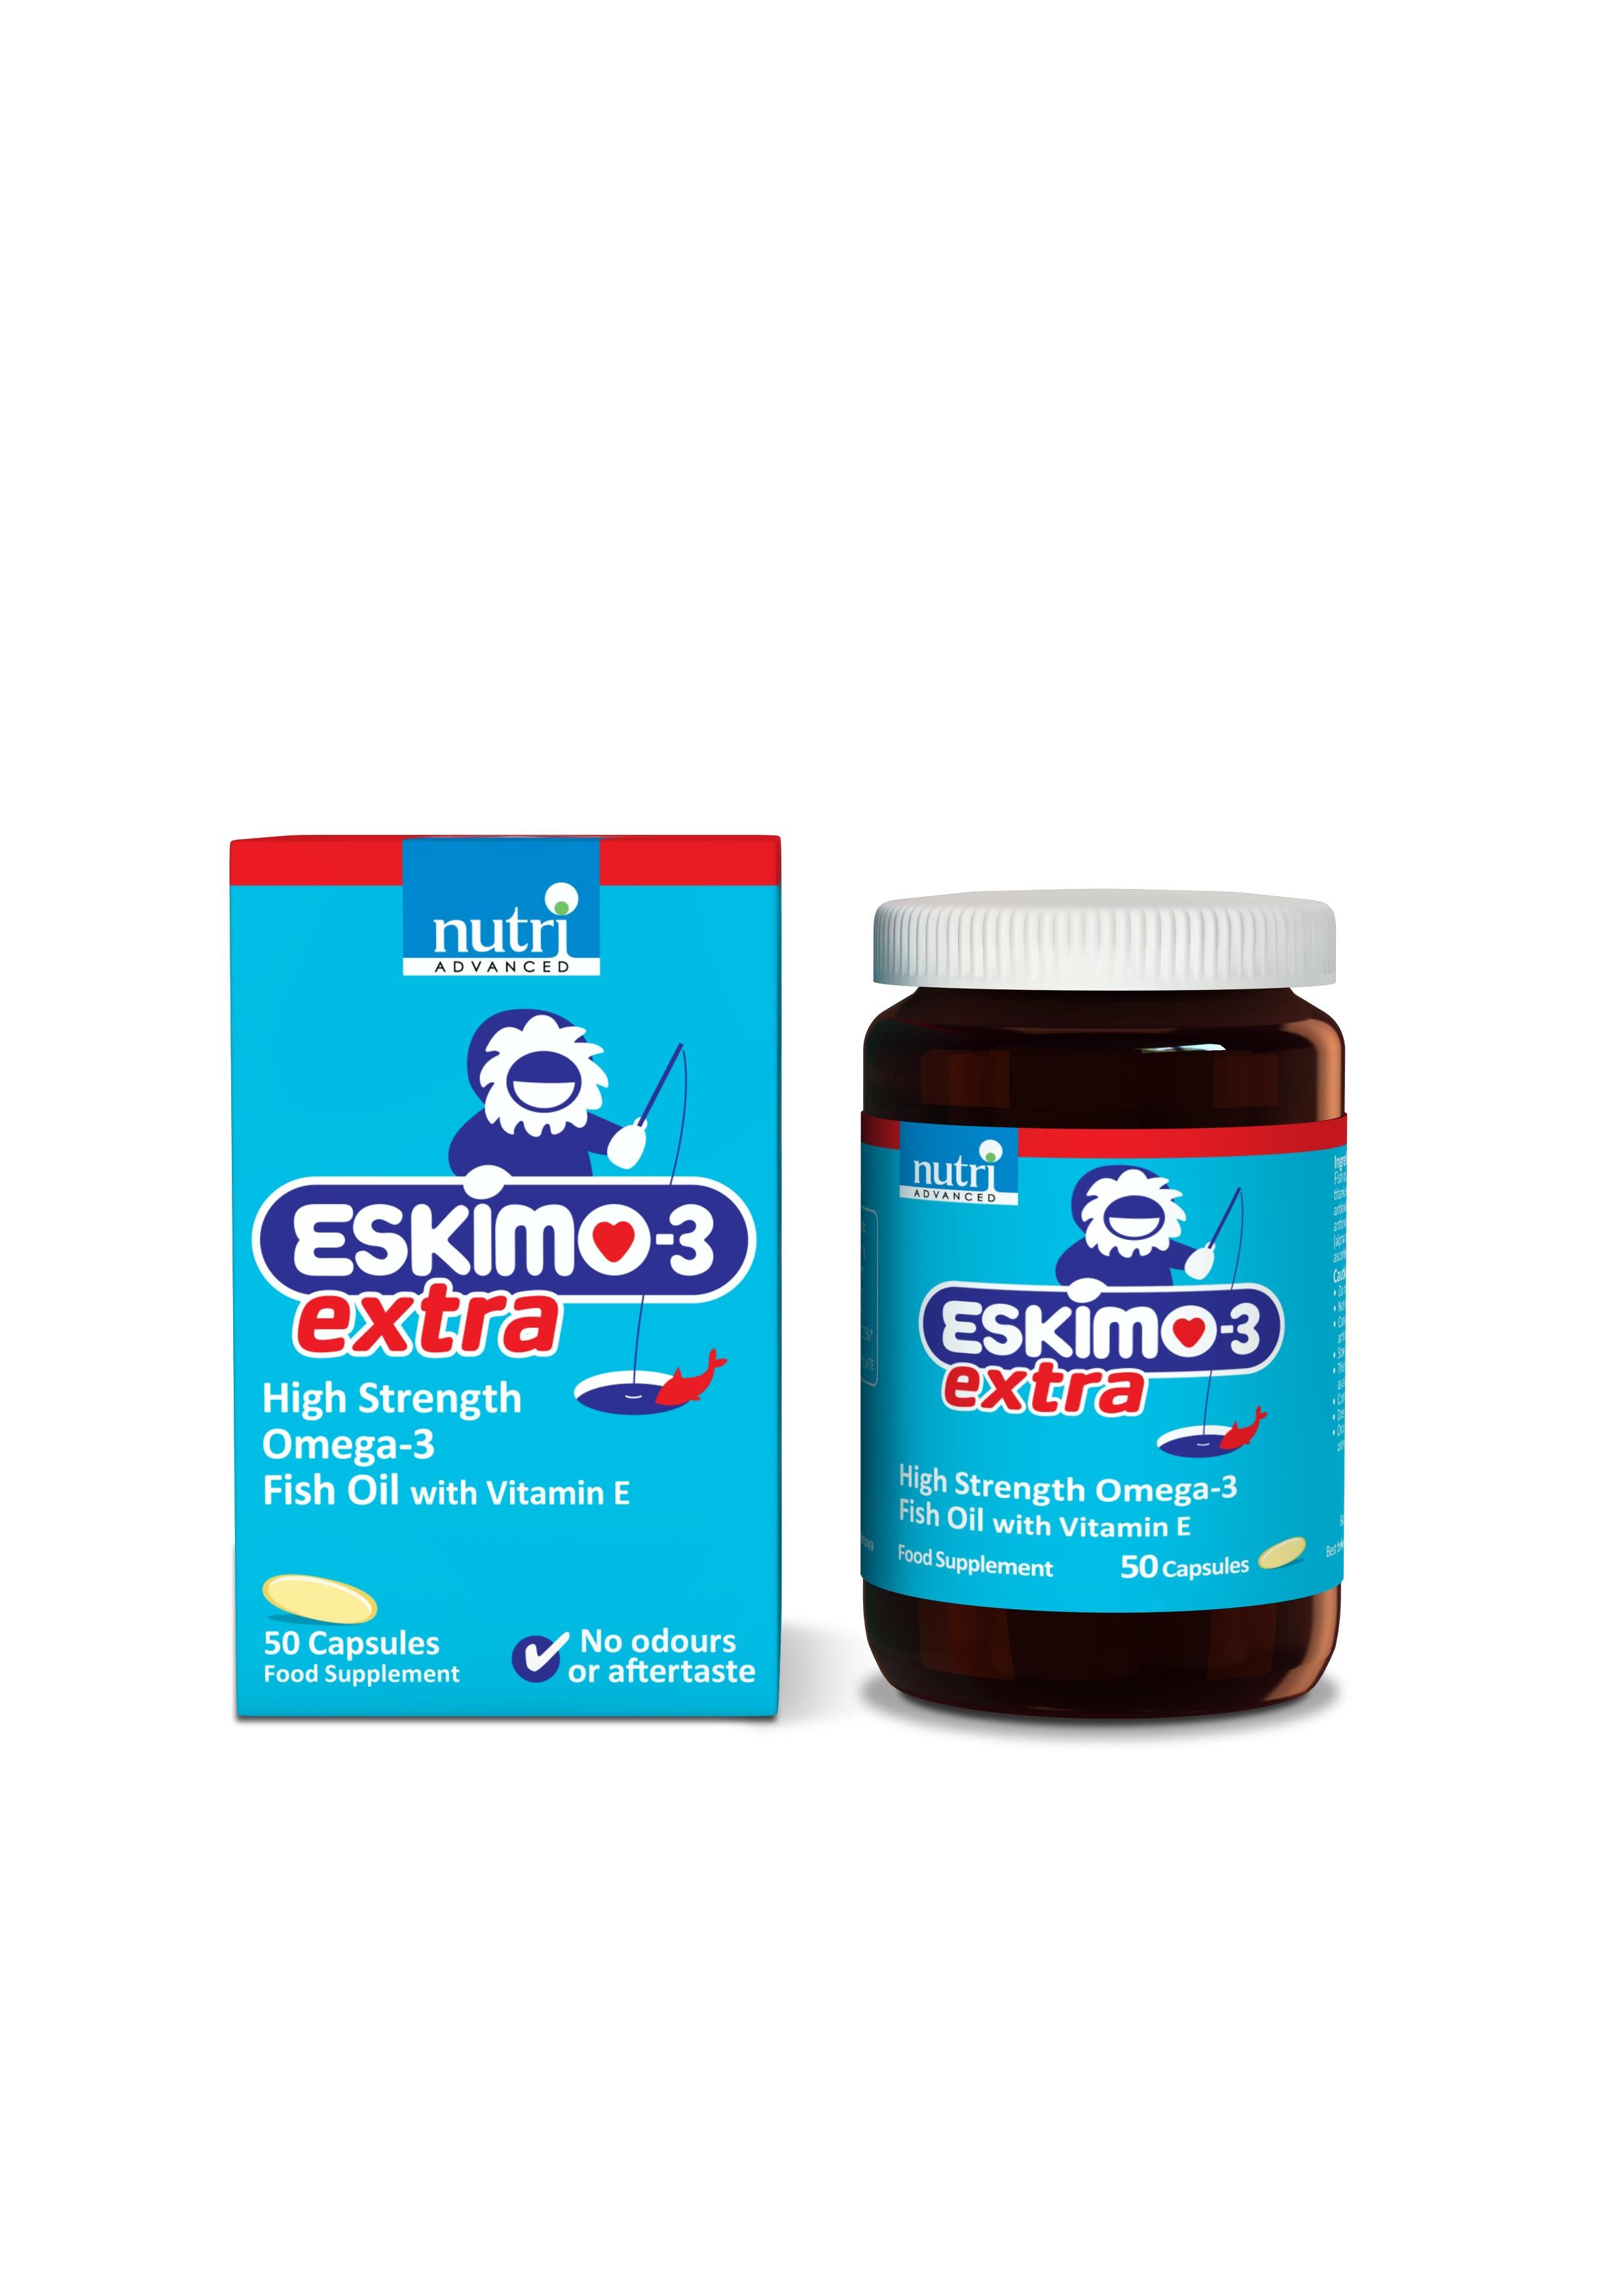 Eskimo-3 Extra 50's